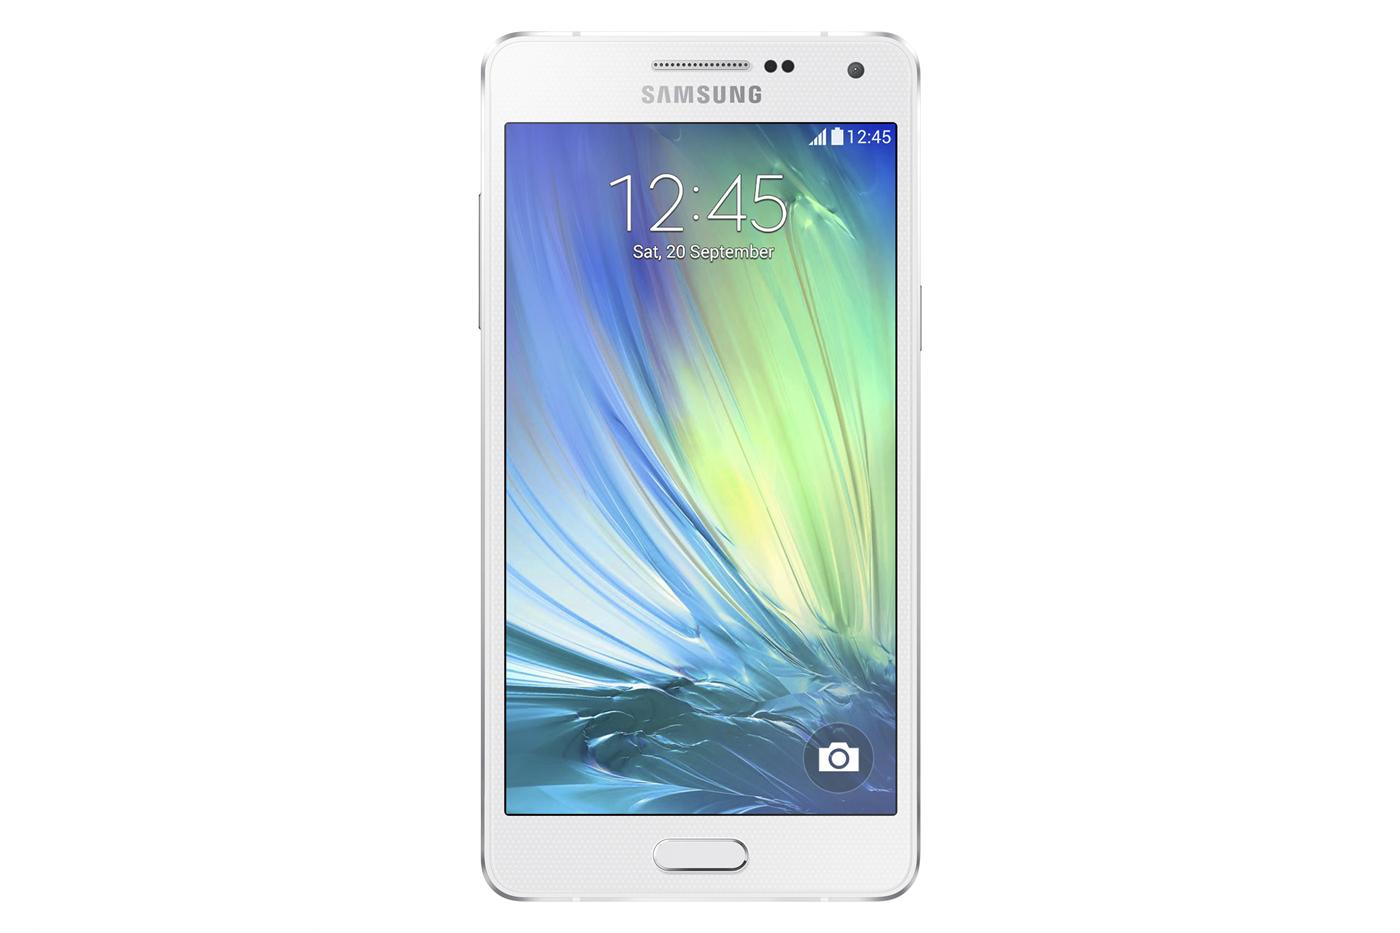 Samsung Galaxy A5 face